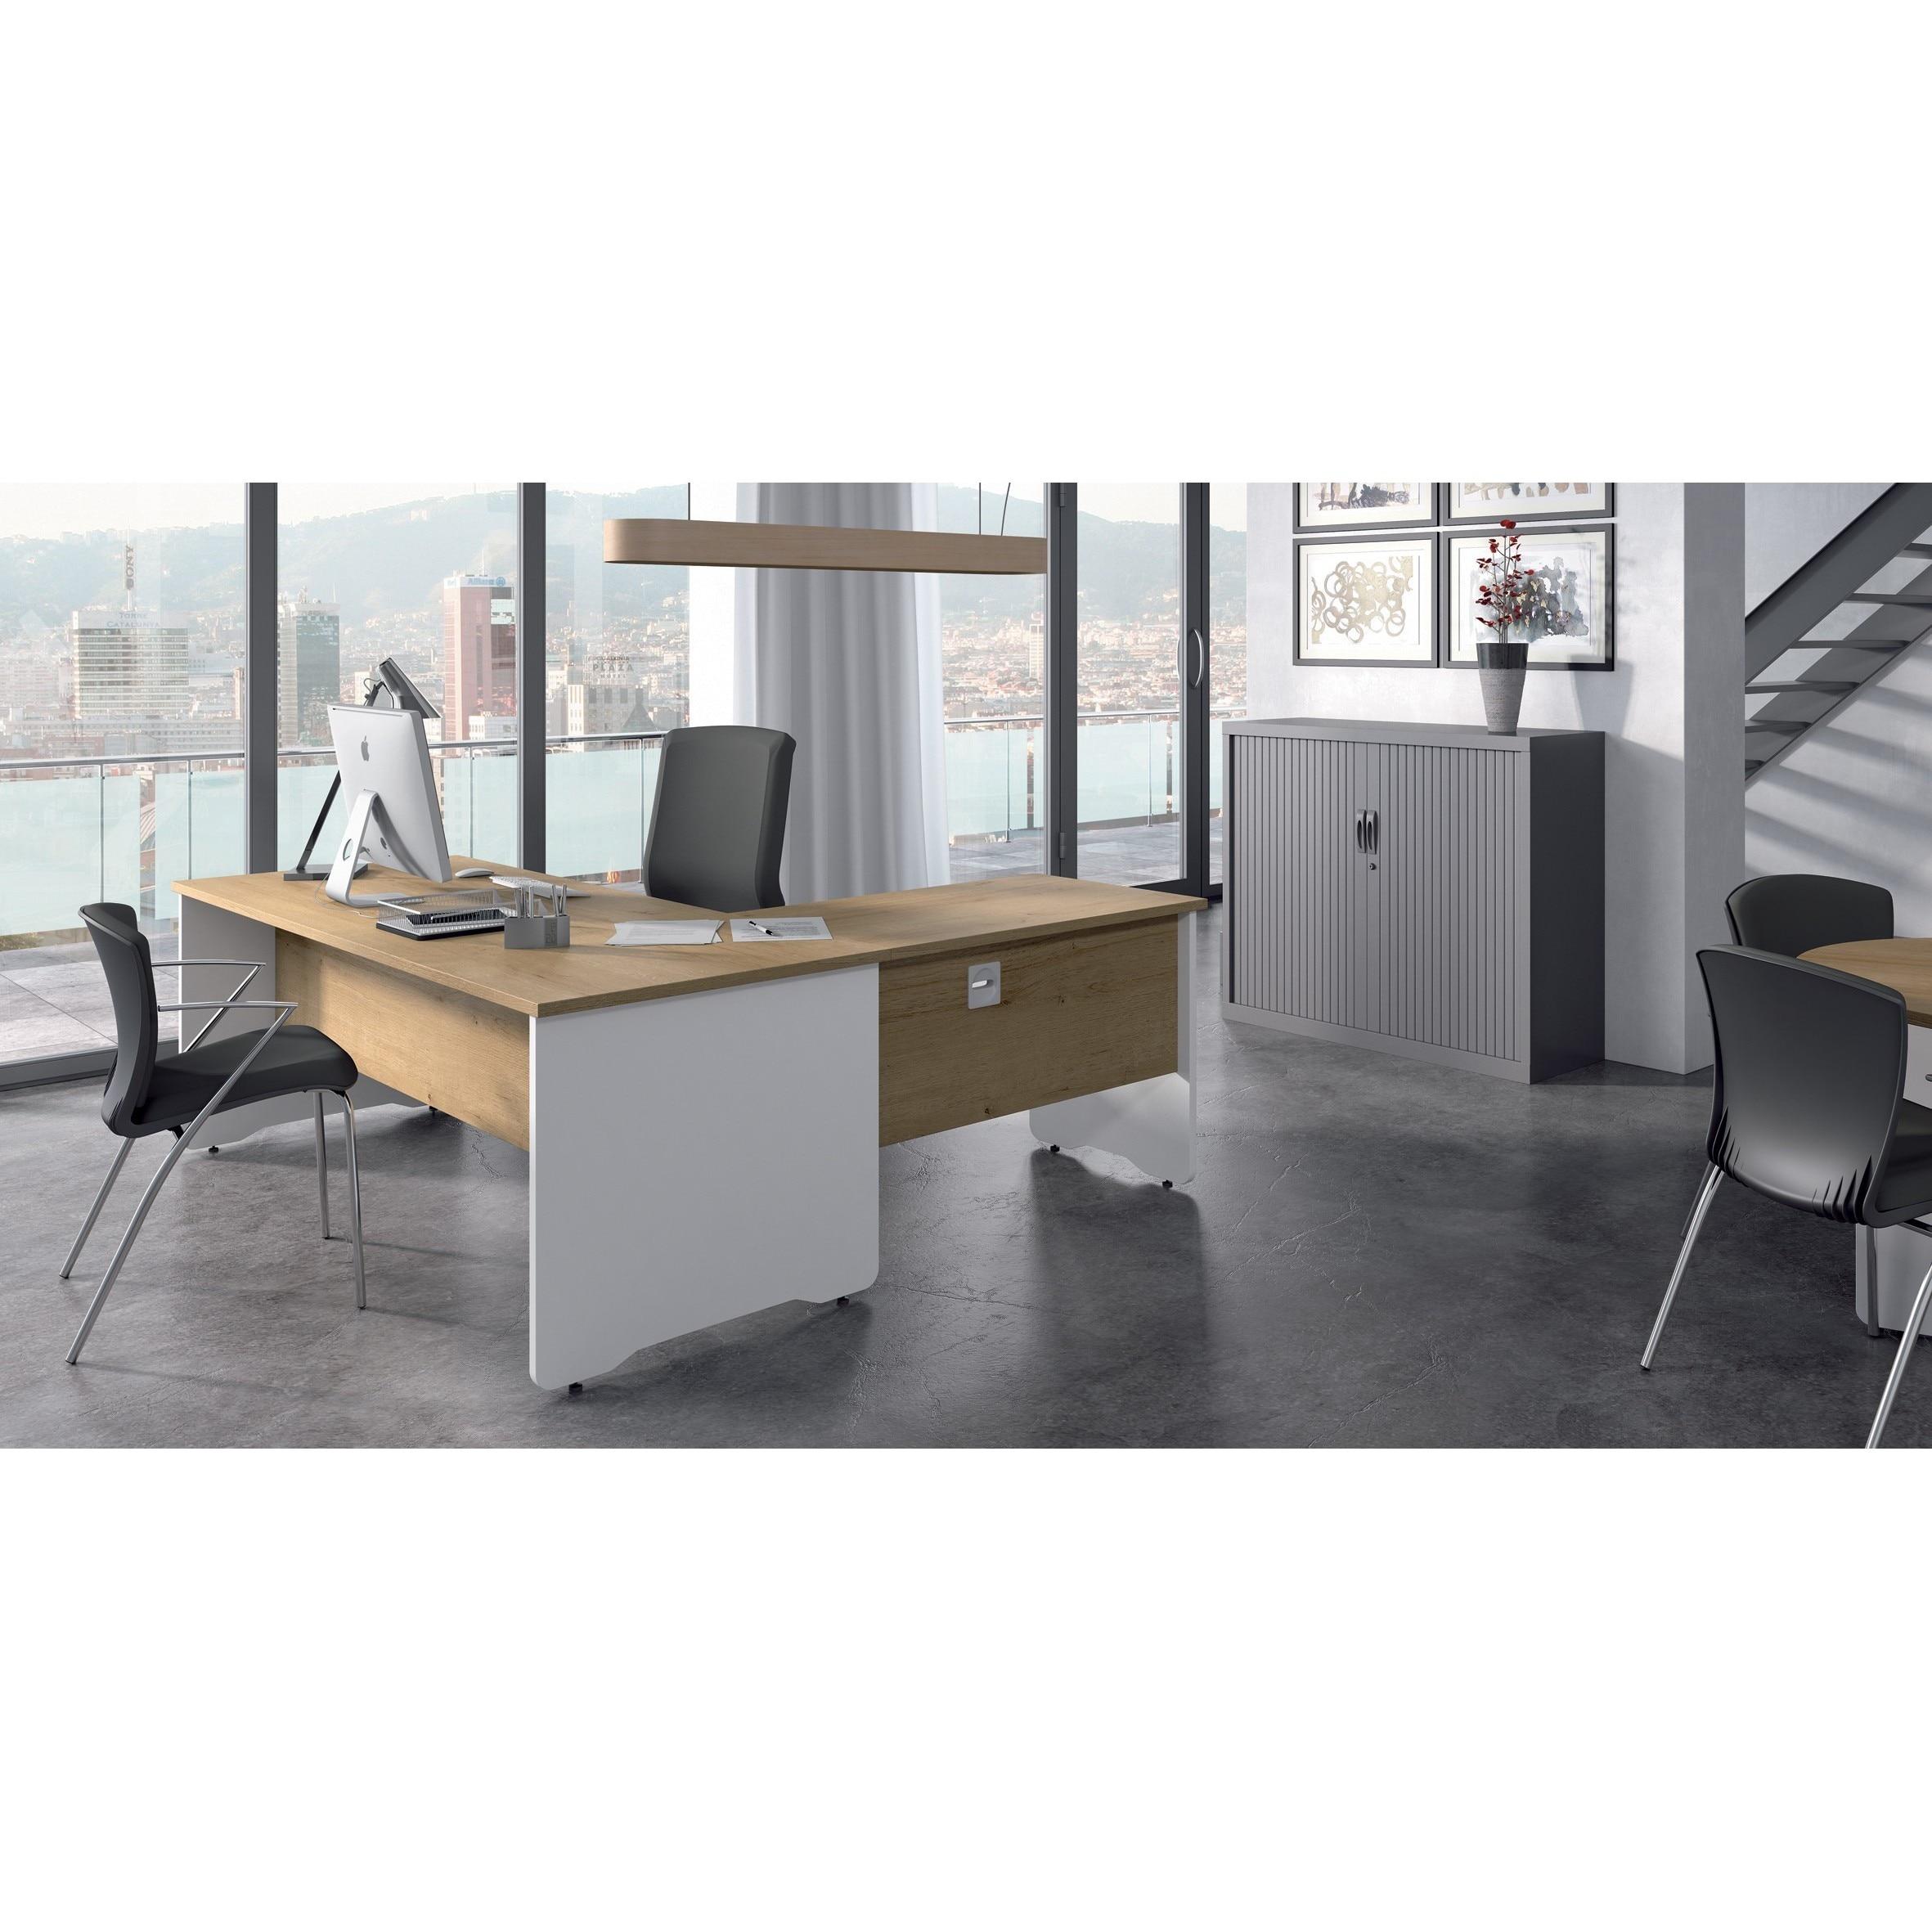 TABLE OFFICE 'S WORK SERIES 140X80 WHITE/OAK